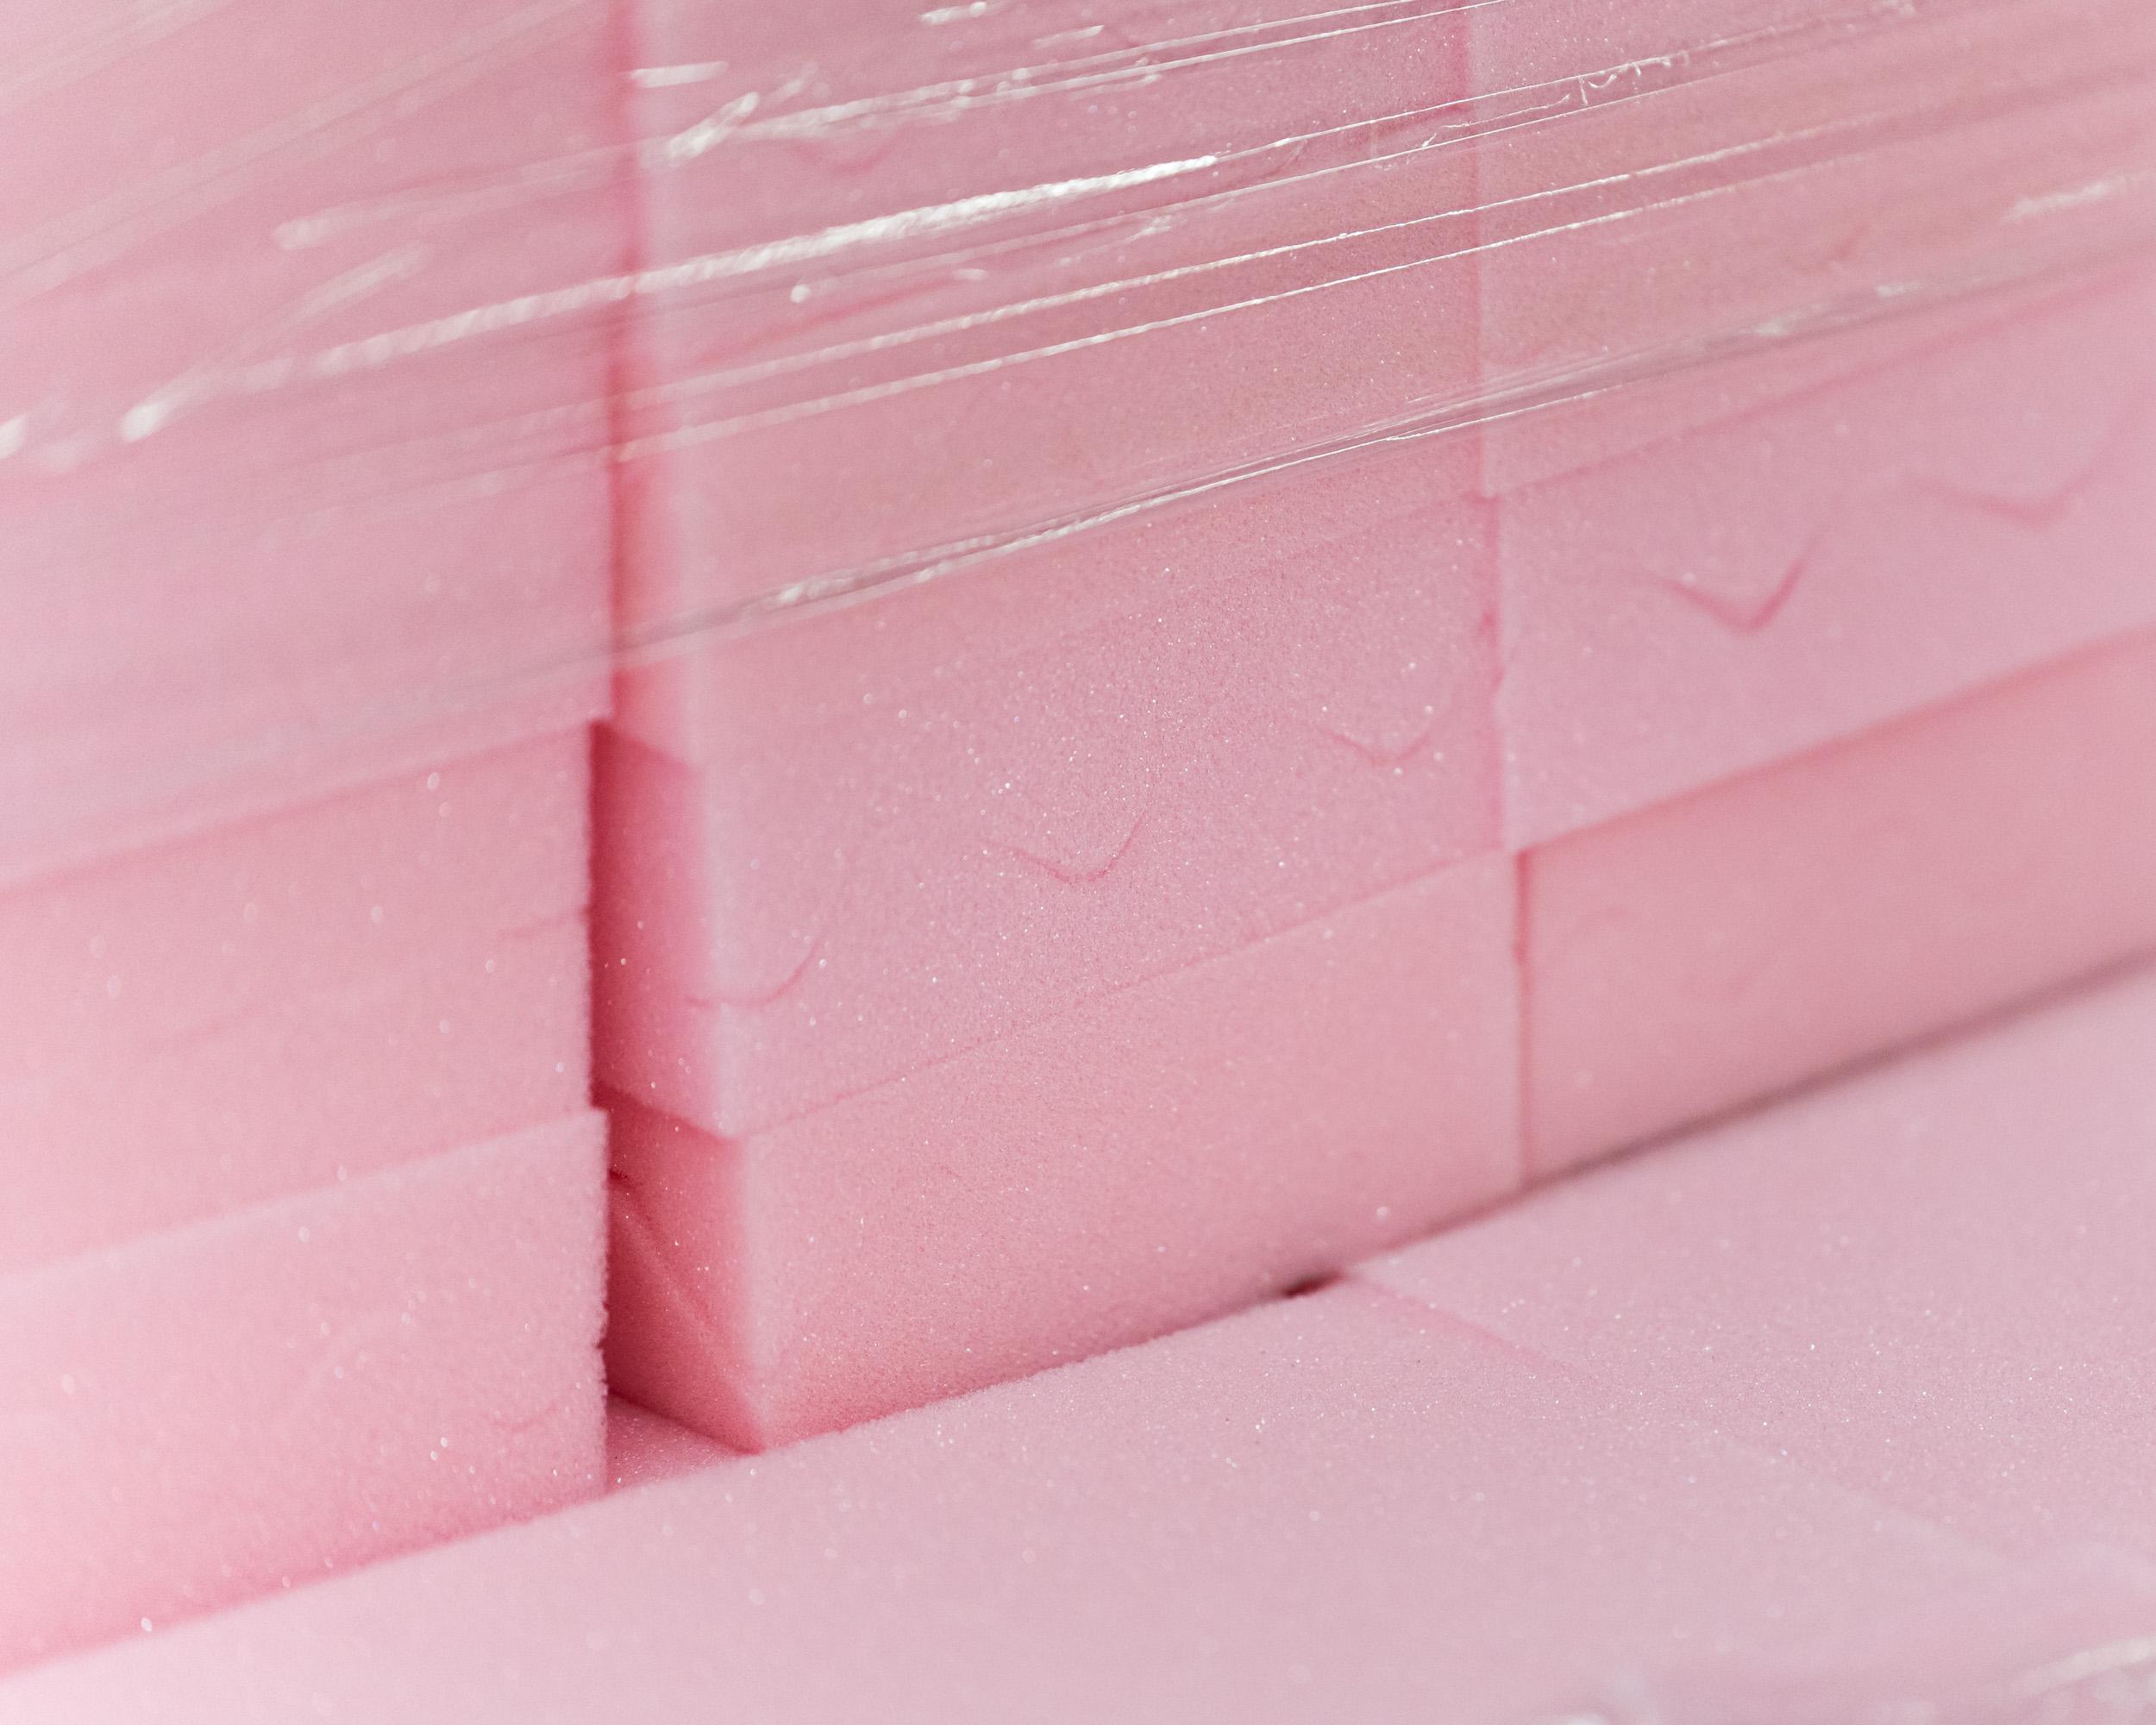 Pink foam pads